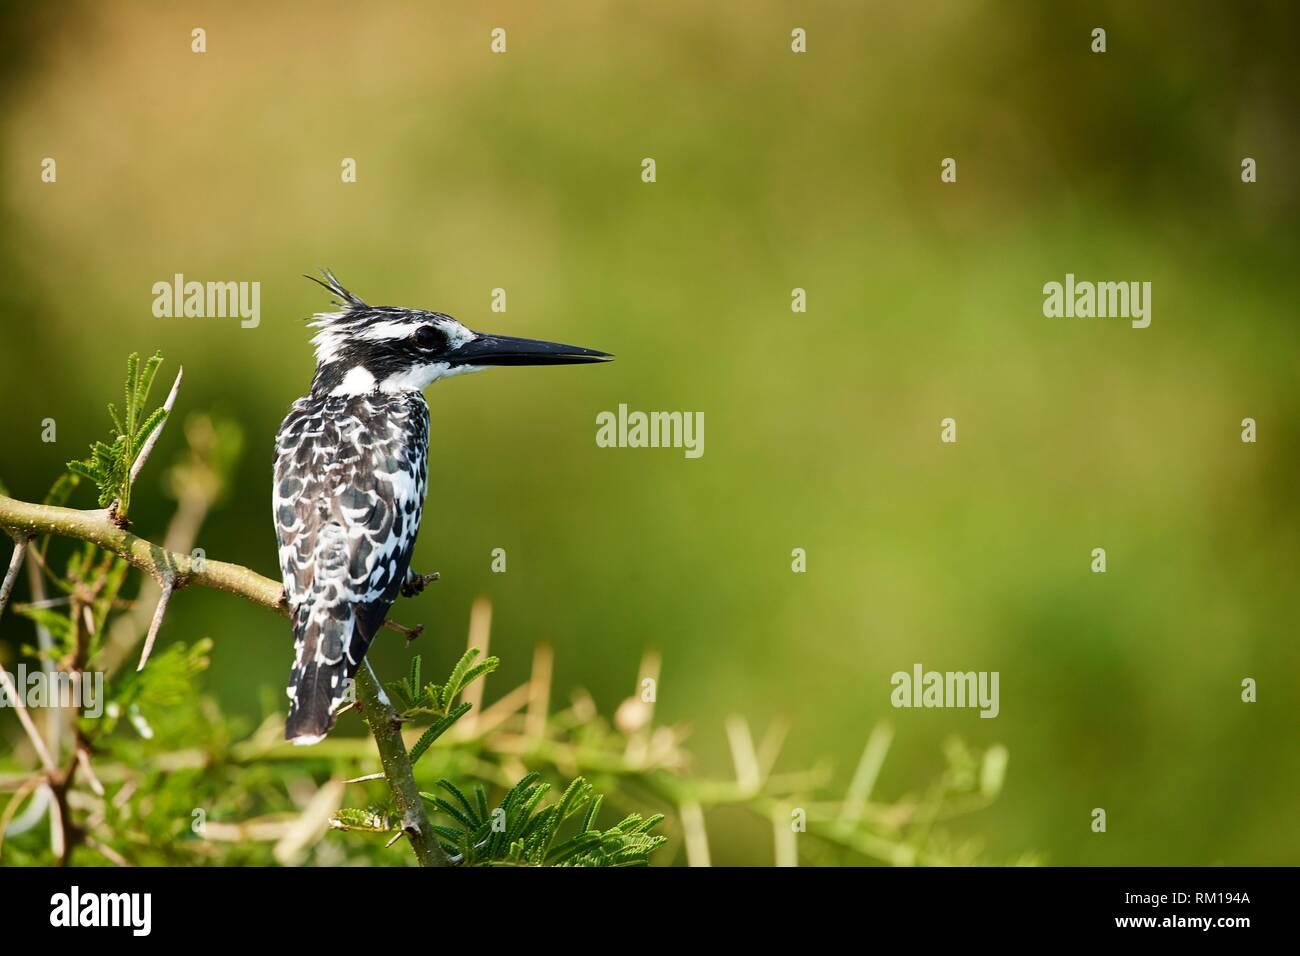 Pied Kingfisher (Ceryle rudis) auf einem Ast sitzend. Queen Elizabeth National Park, Uganda, Afrika. Stockbild